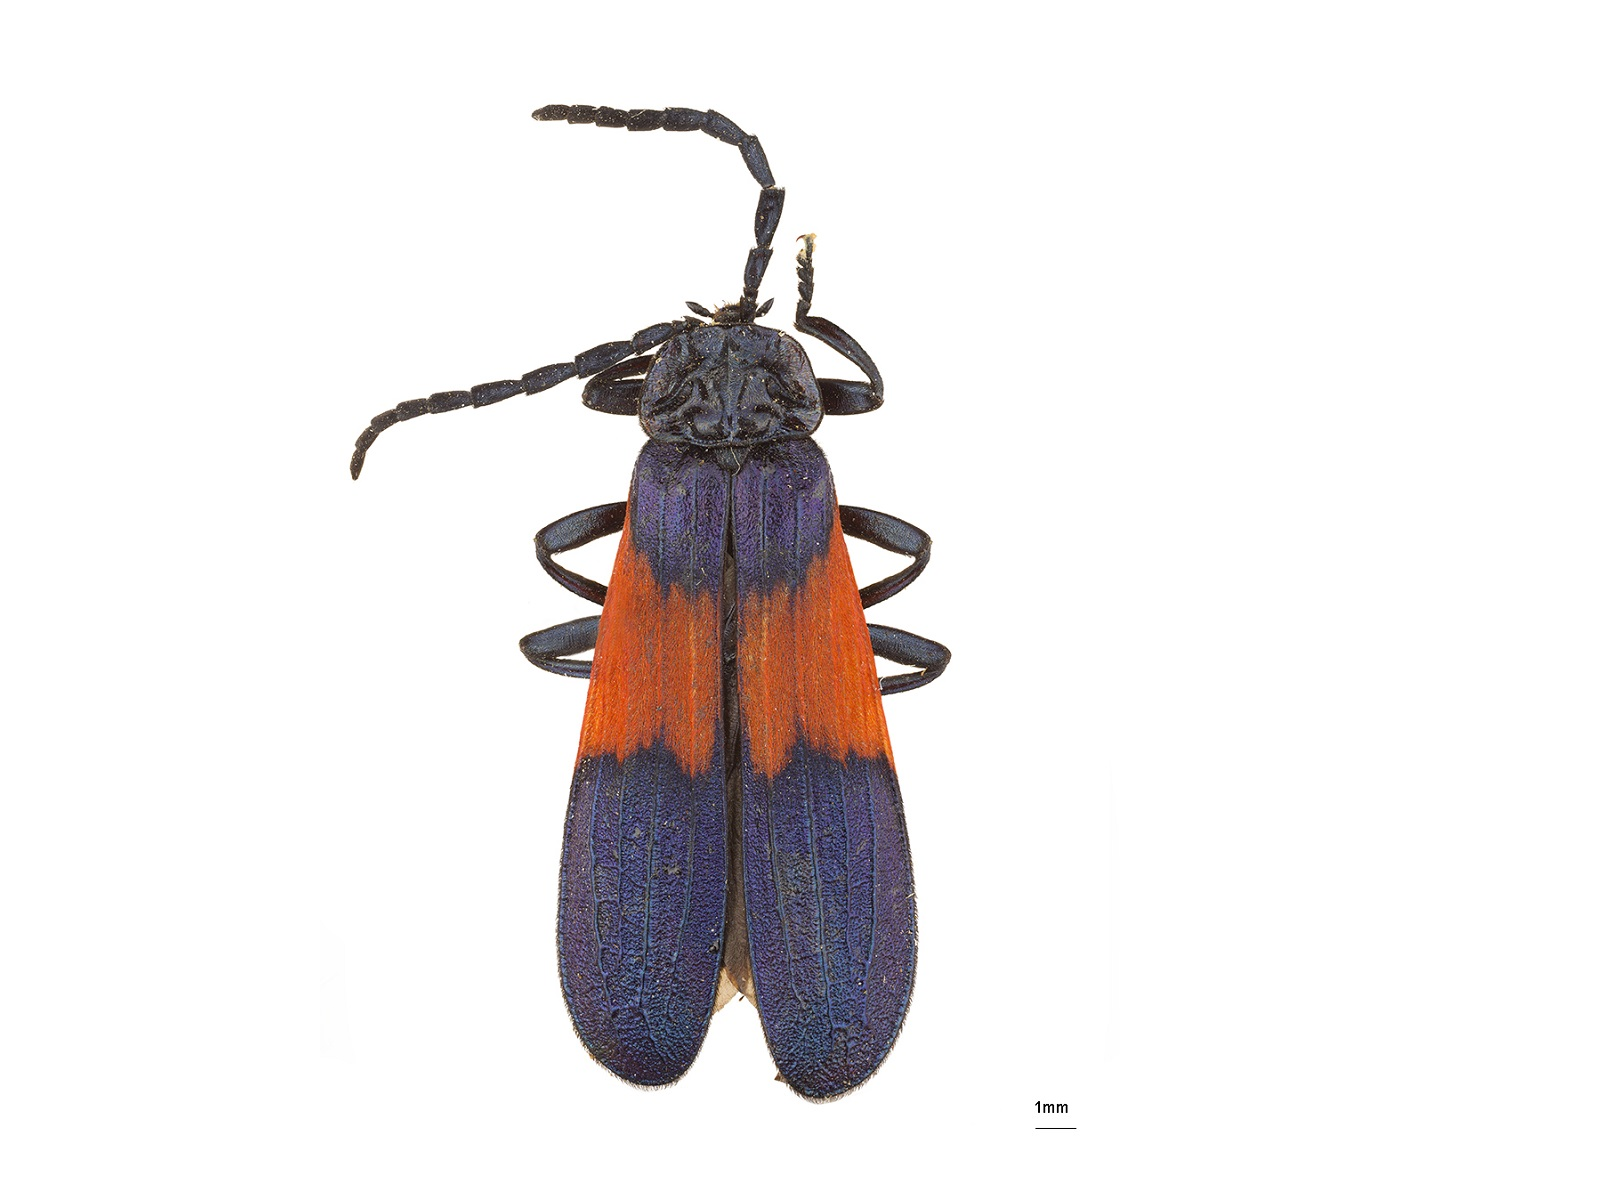 Macrolygistopterus spp.